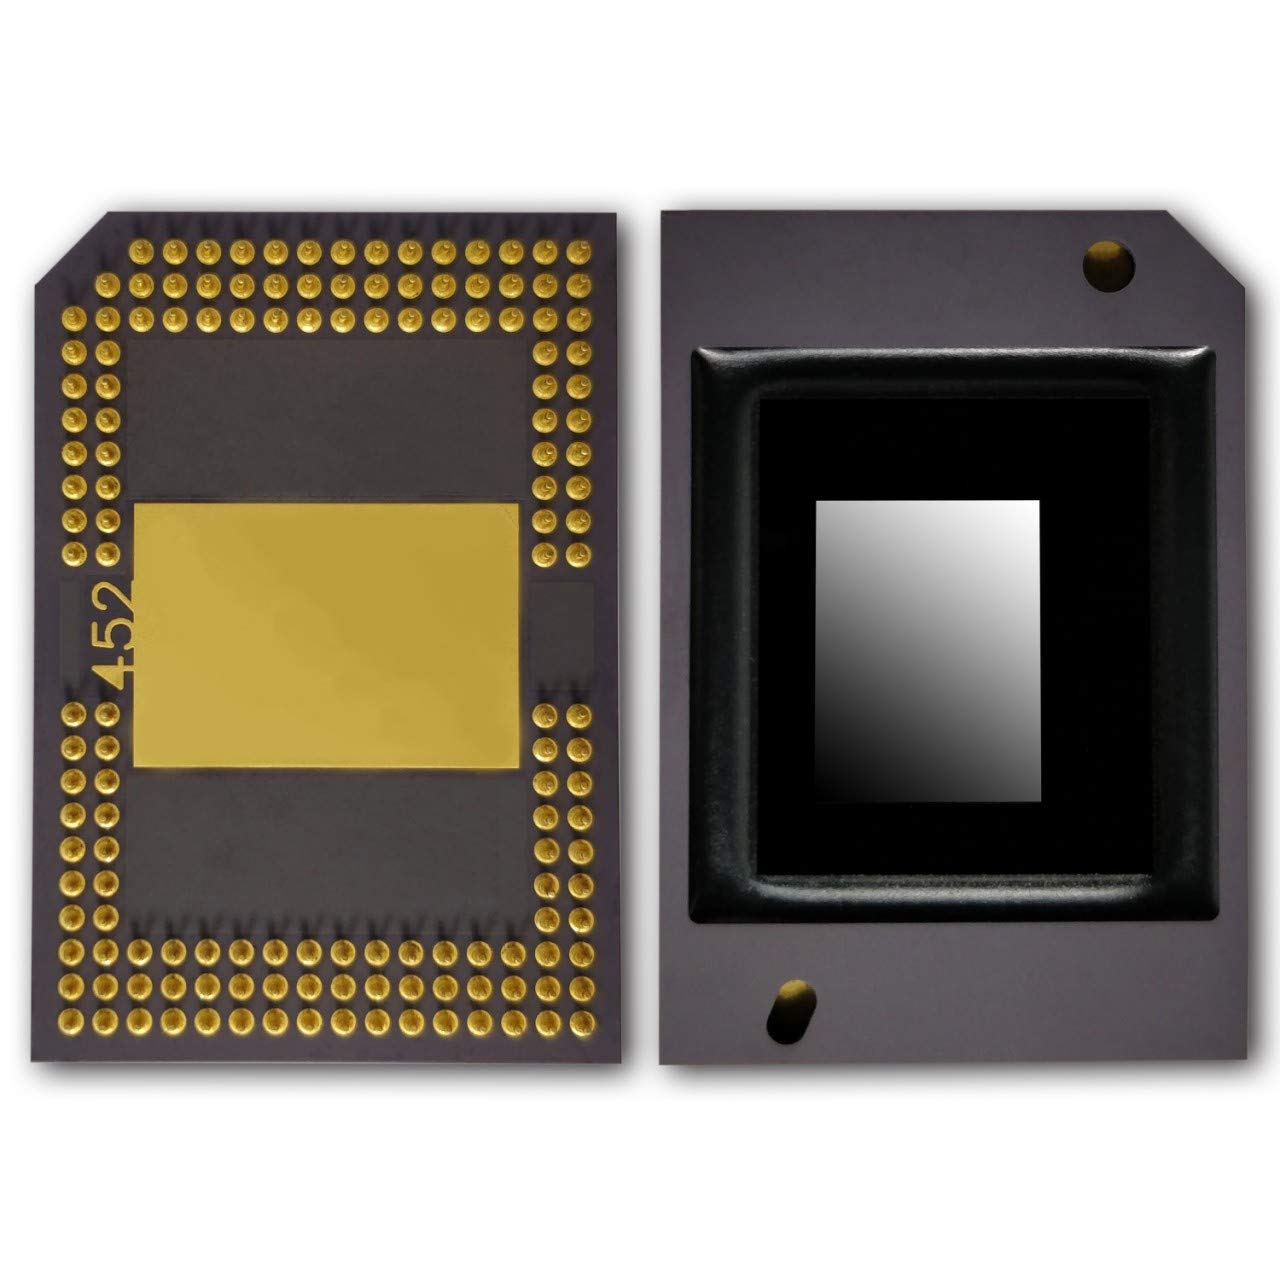 NEC NP-U300X NP-V300X NP-V311Xプロジェクター用純正OEMDMD/DLPチップ   B07PR9TH6X